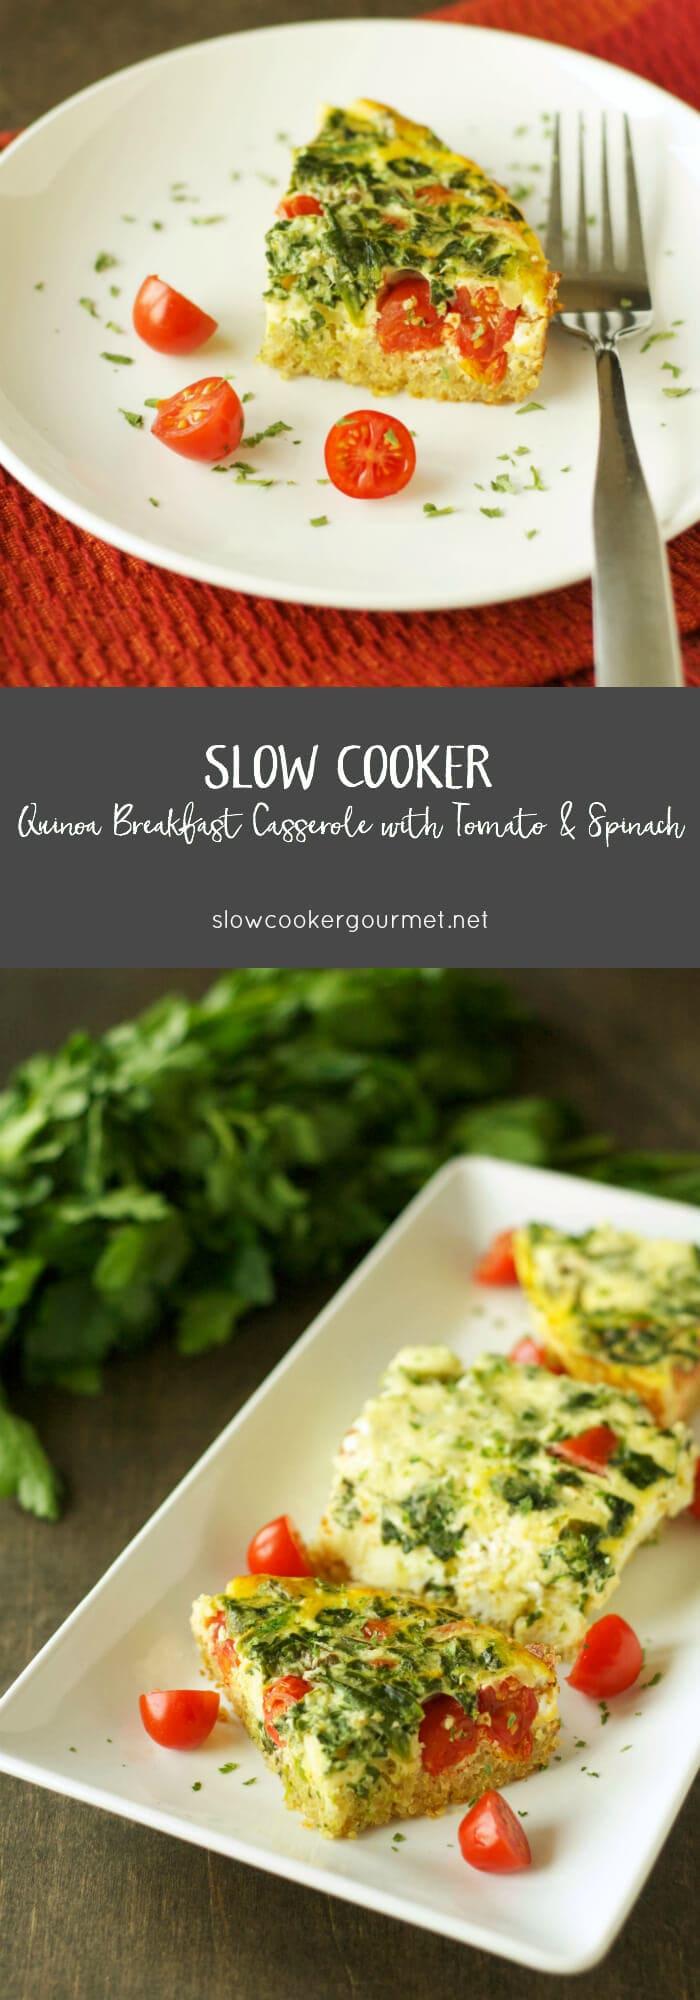 scg-quinoa-breakfast-casserole-longpin